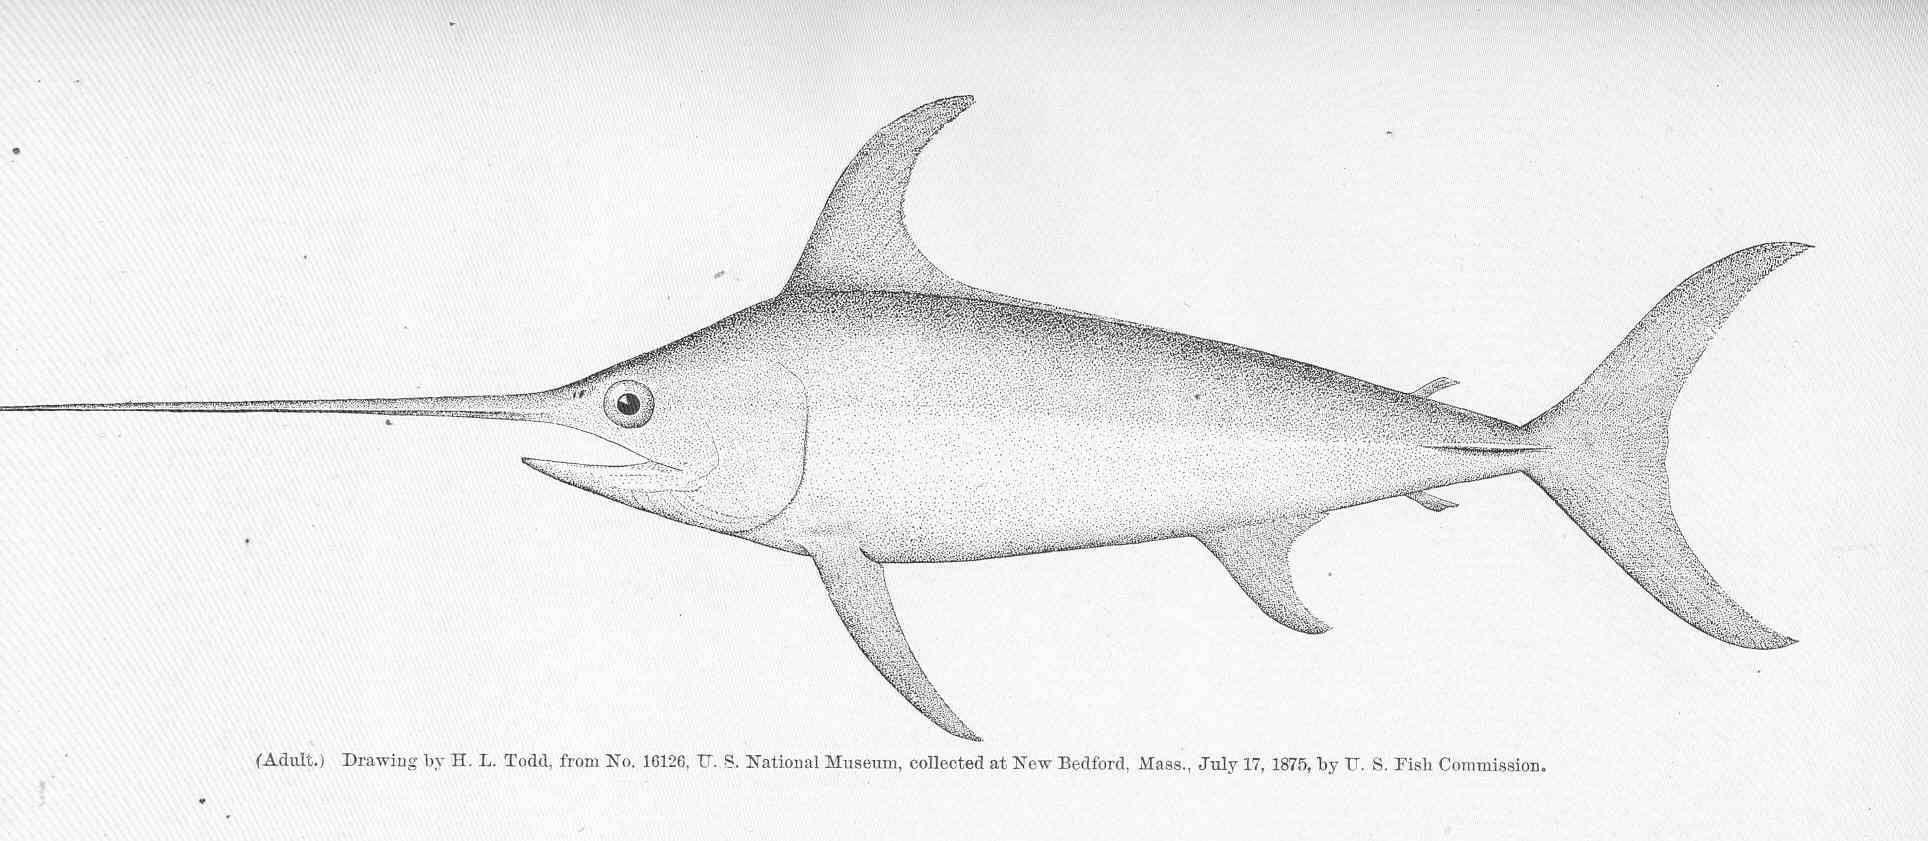 Image of swordfish